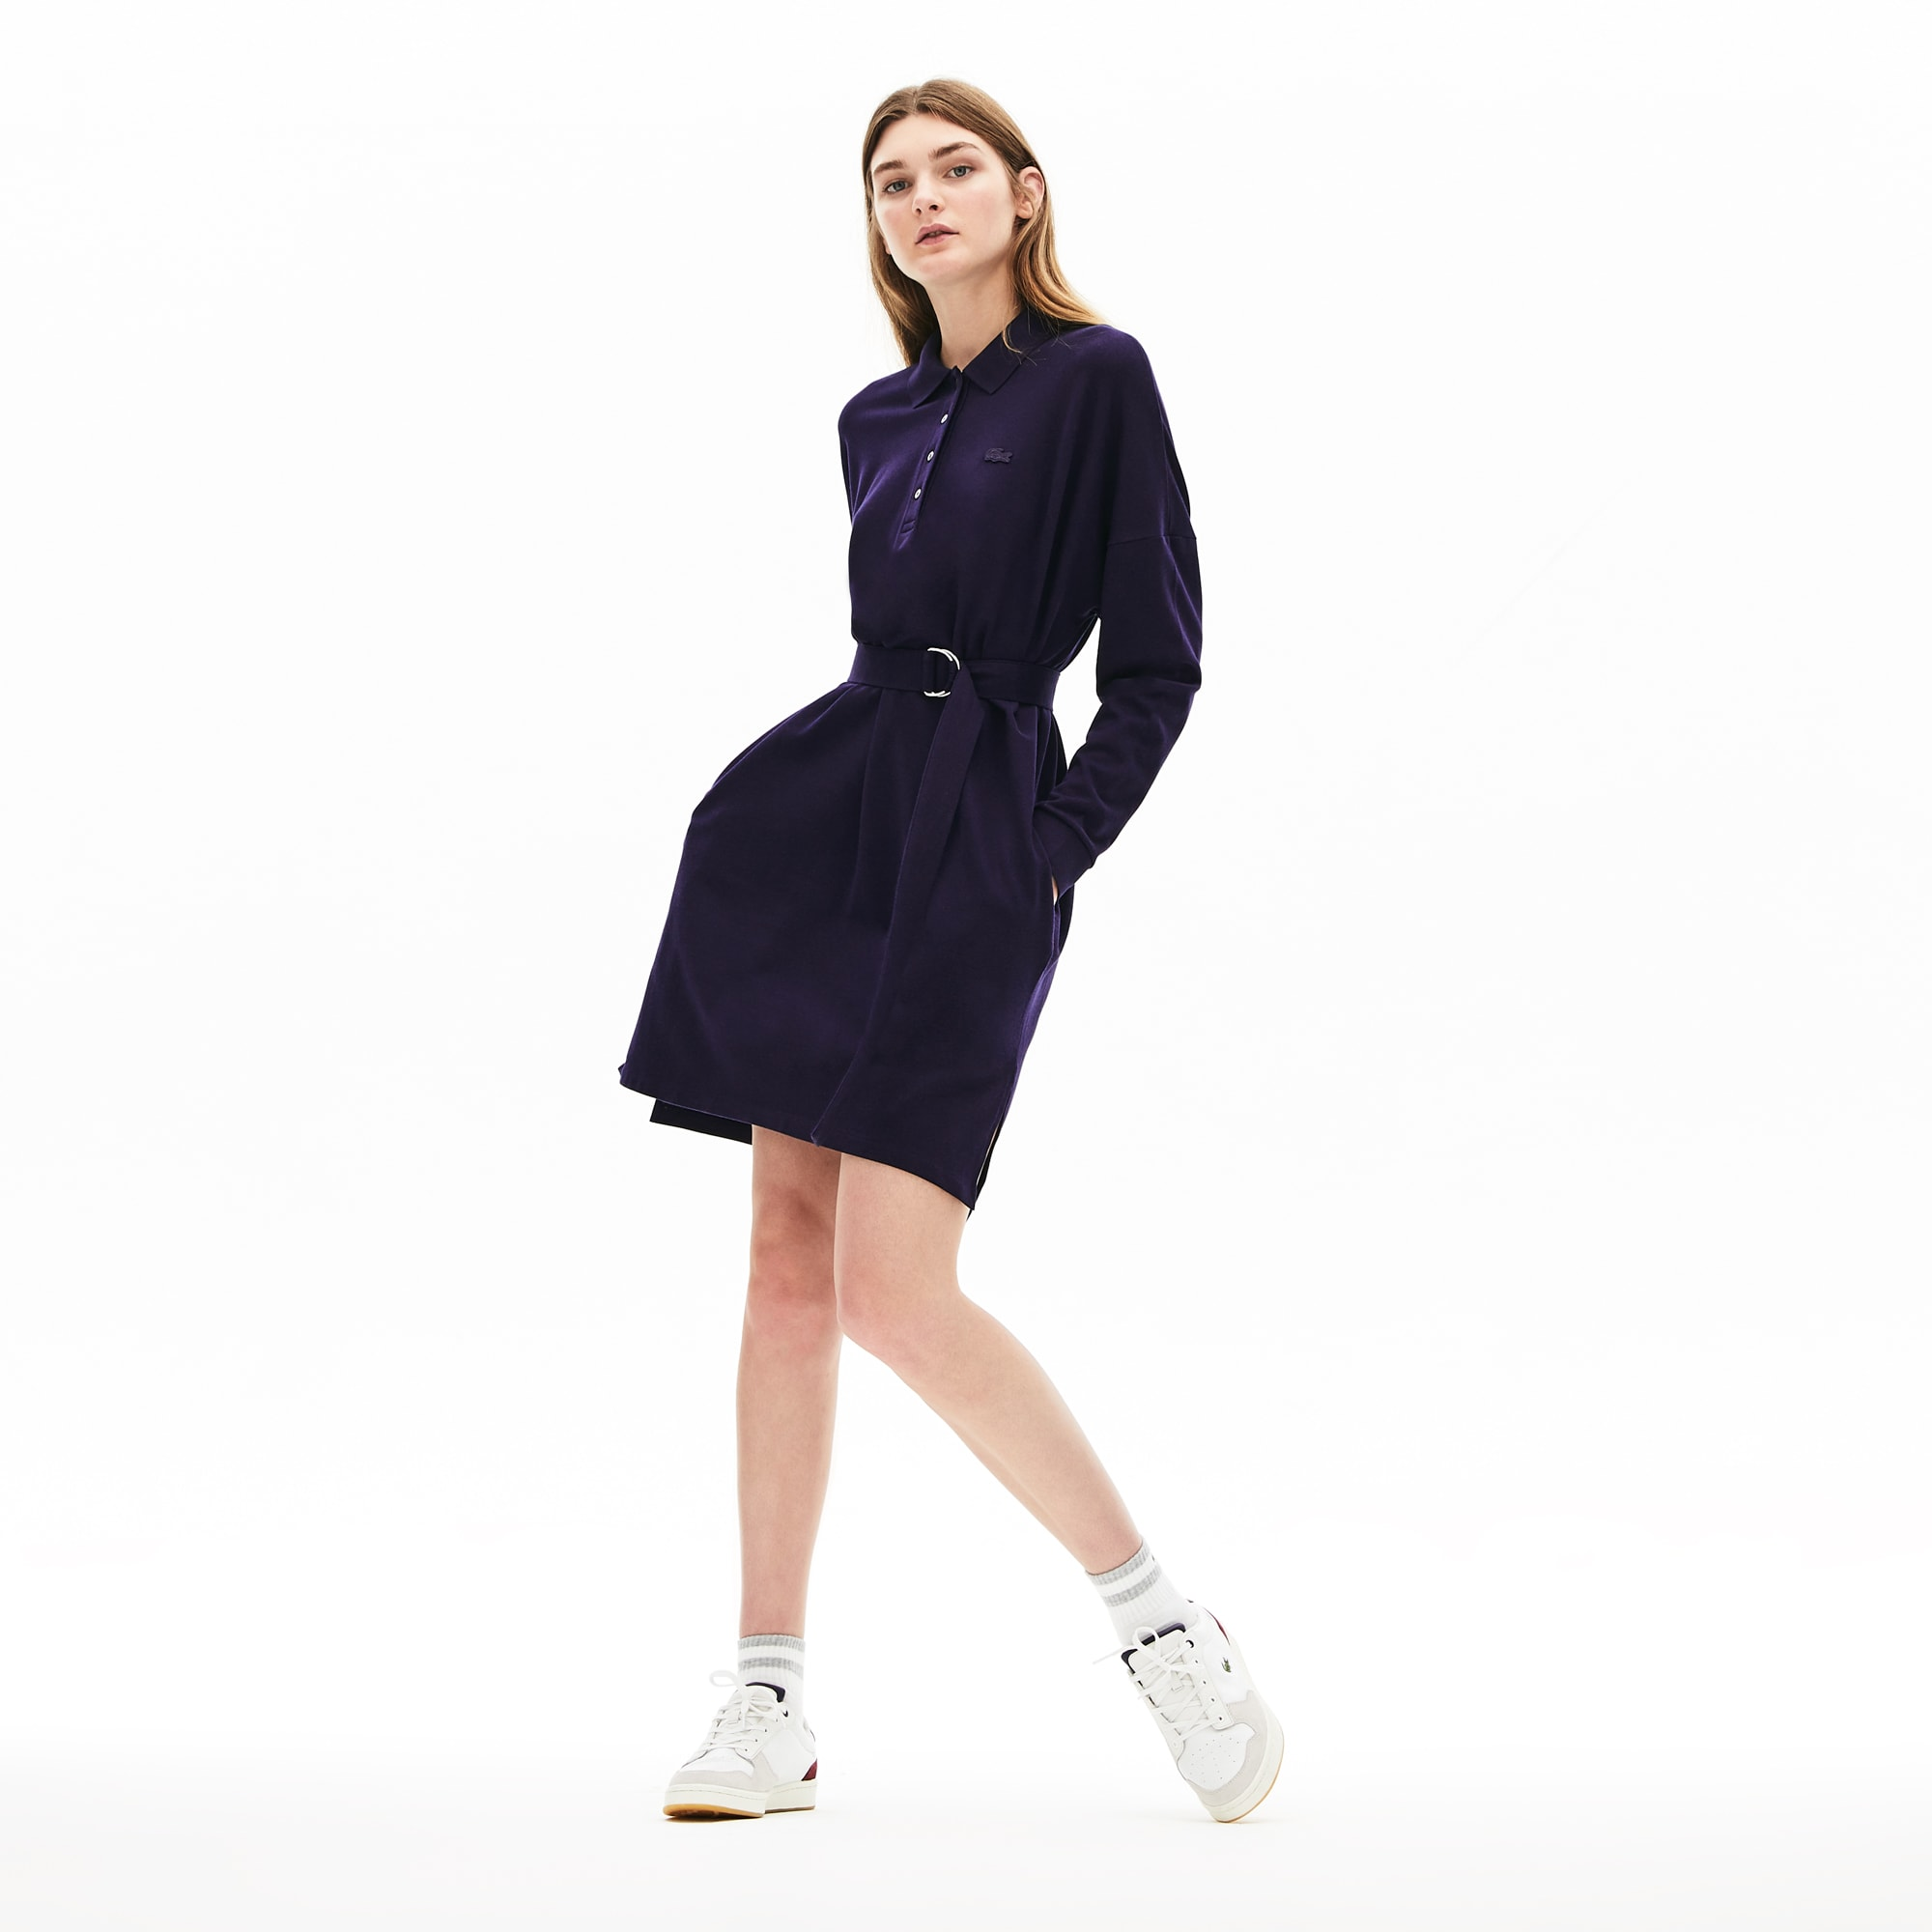 Lacoste Dresses Women's Dolman-Sleeve Piqué Polo Dress